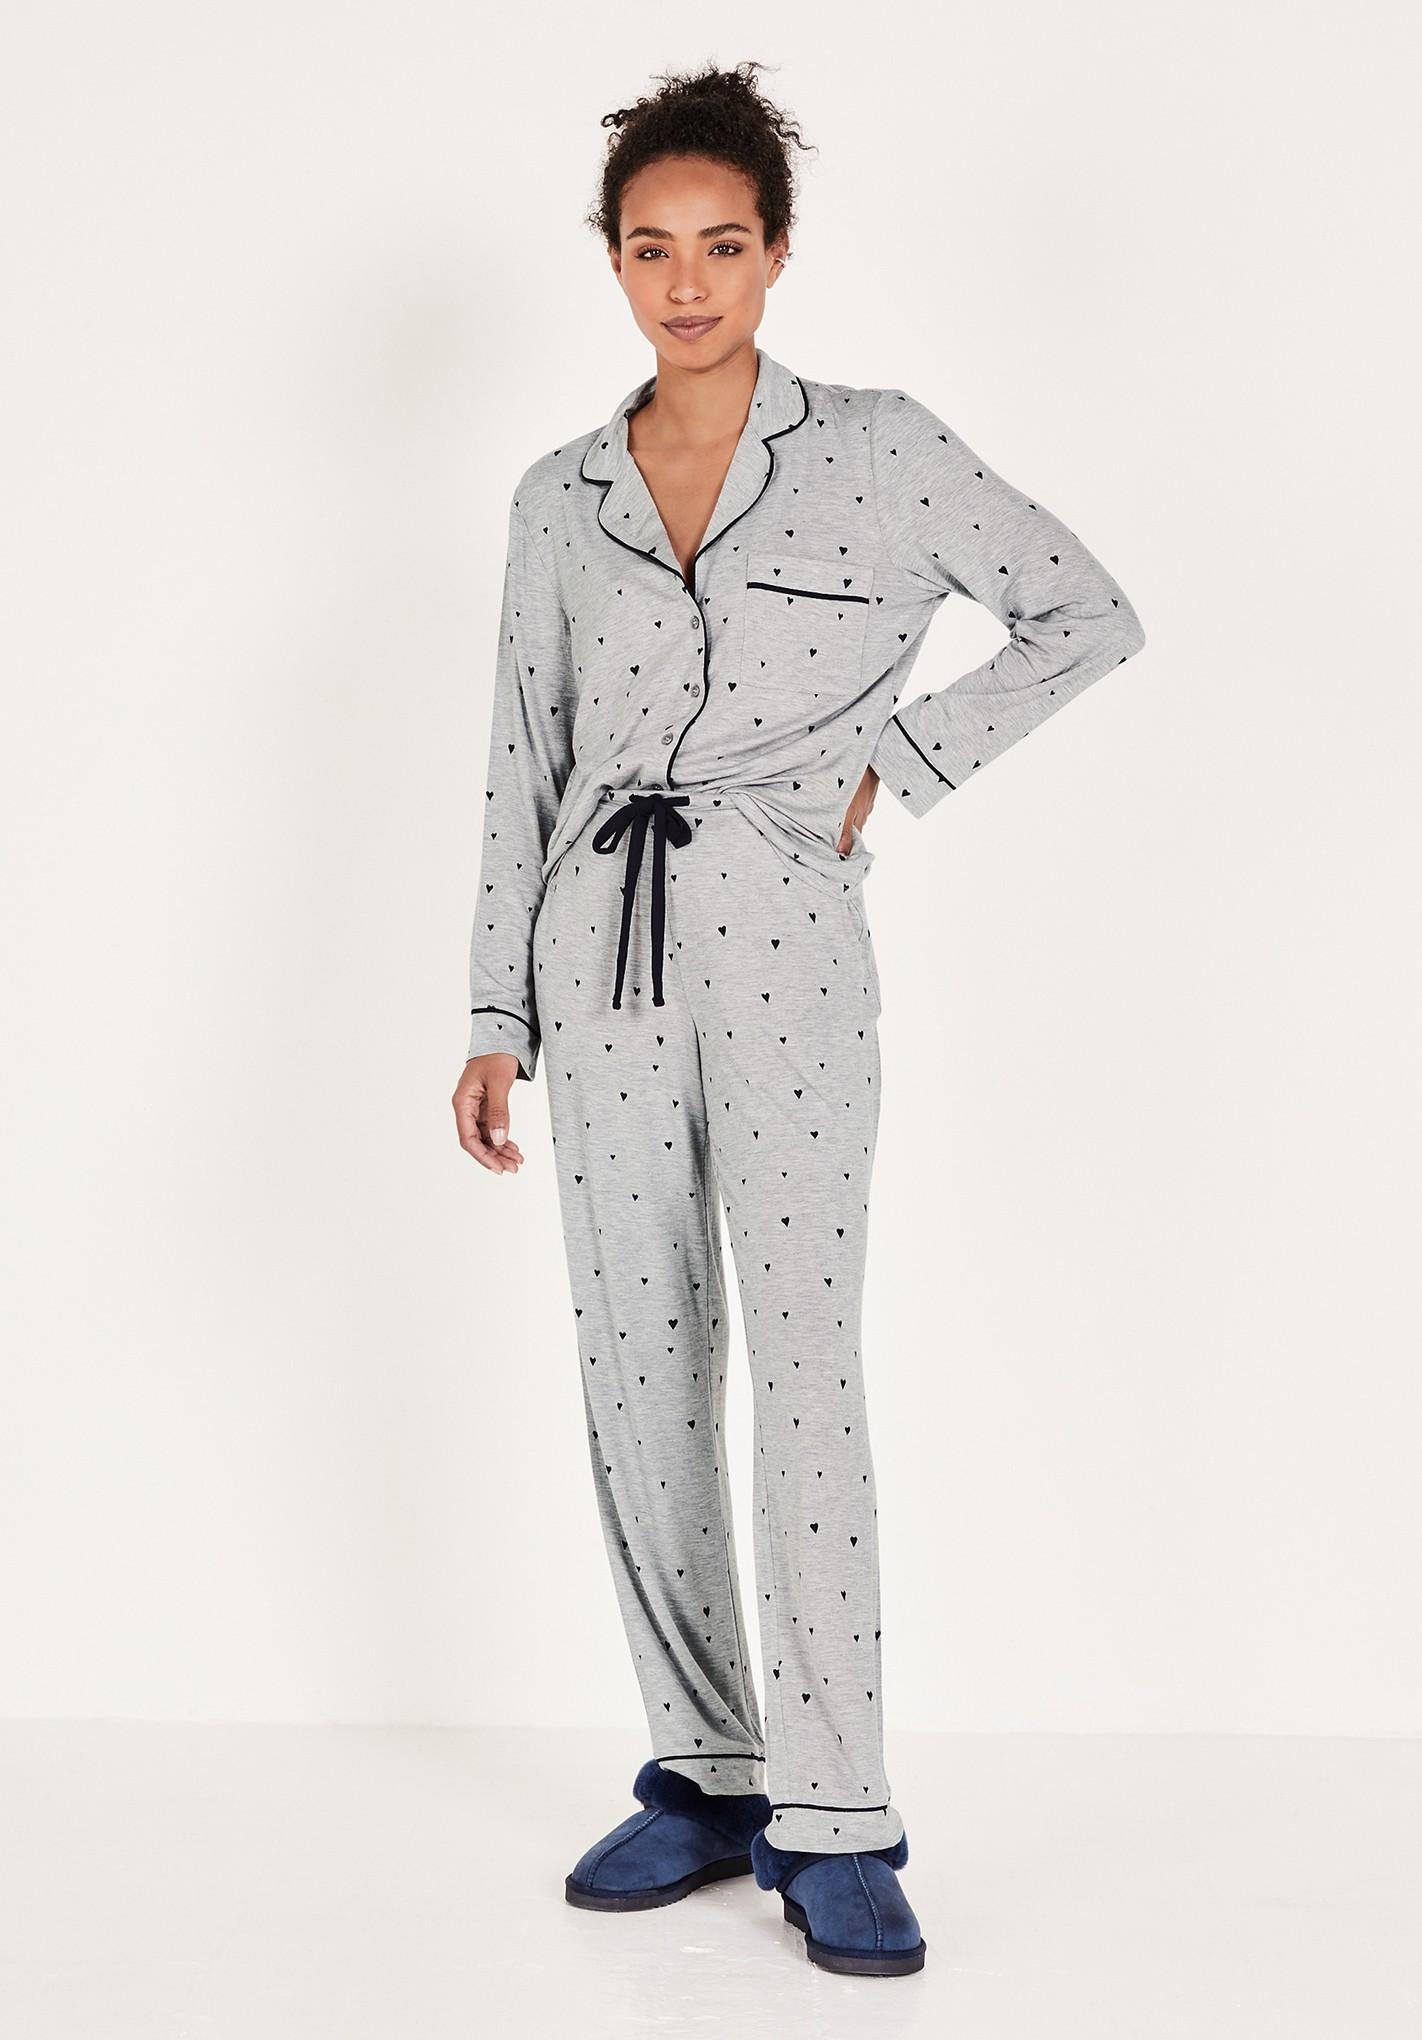 hush grey-marl-heart-print annabel jersey pyjamas grey